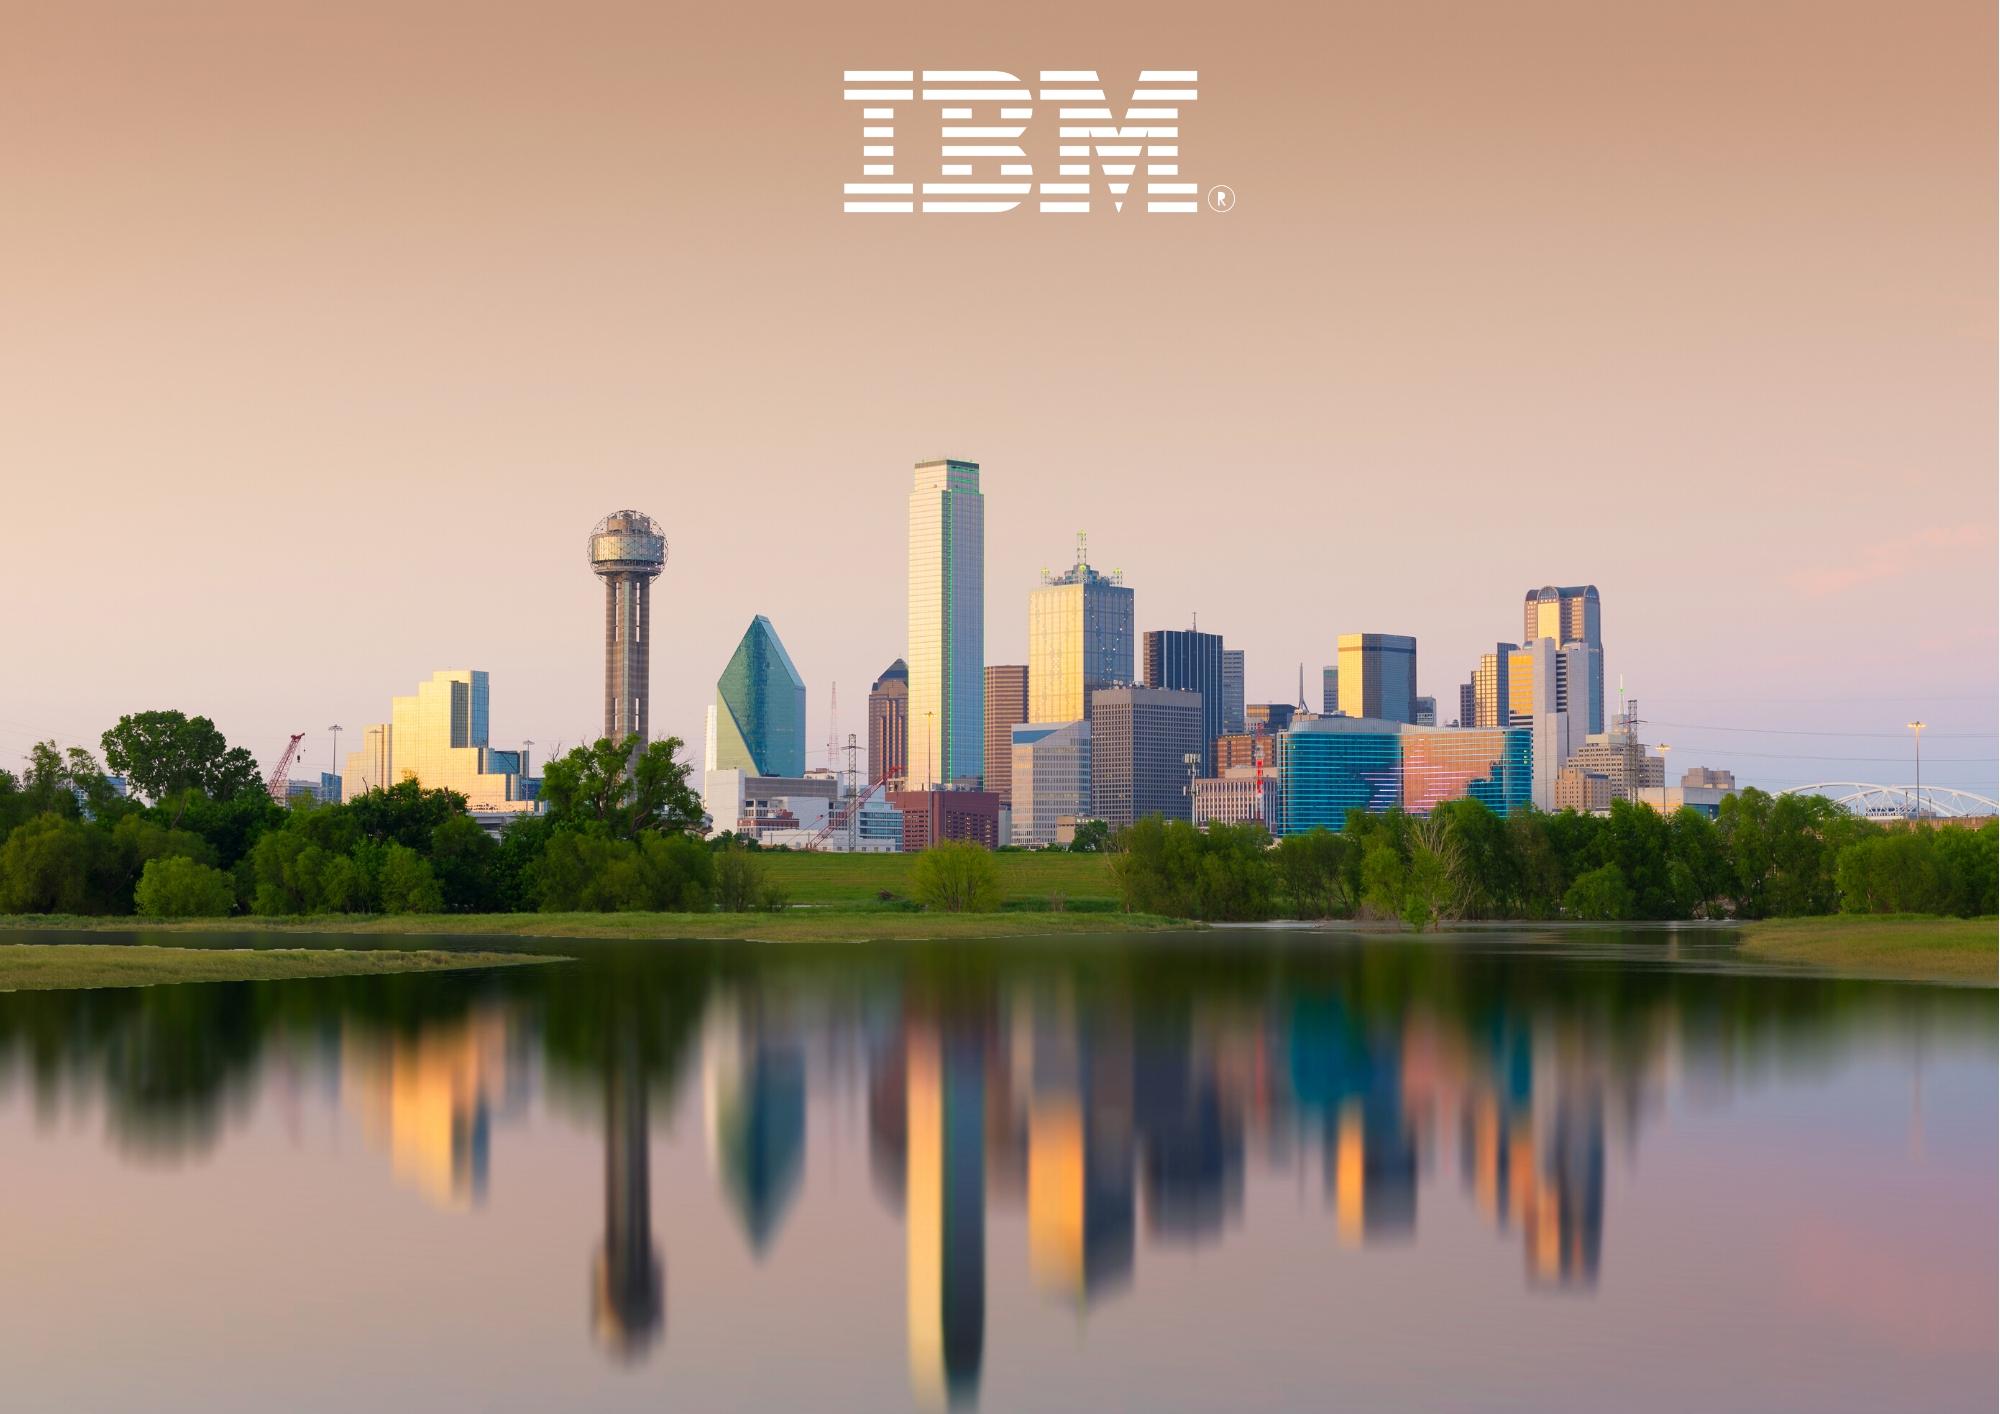 website event listing images - IBM Dallas